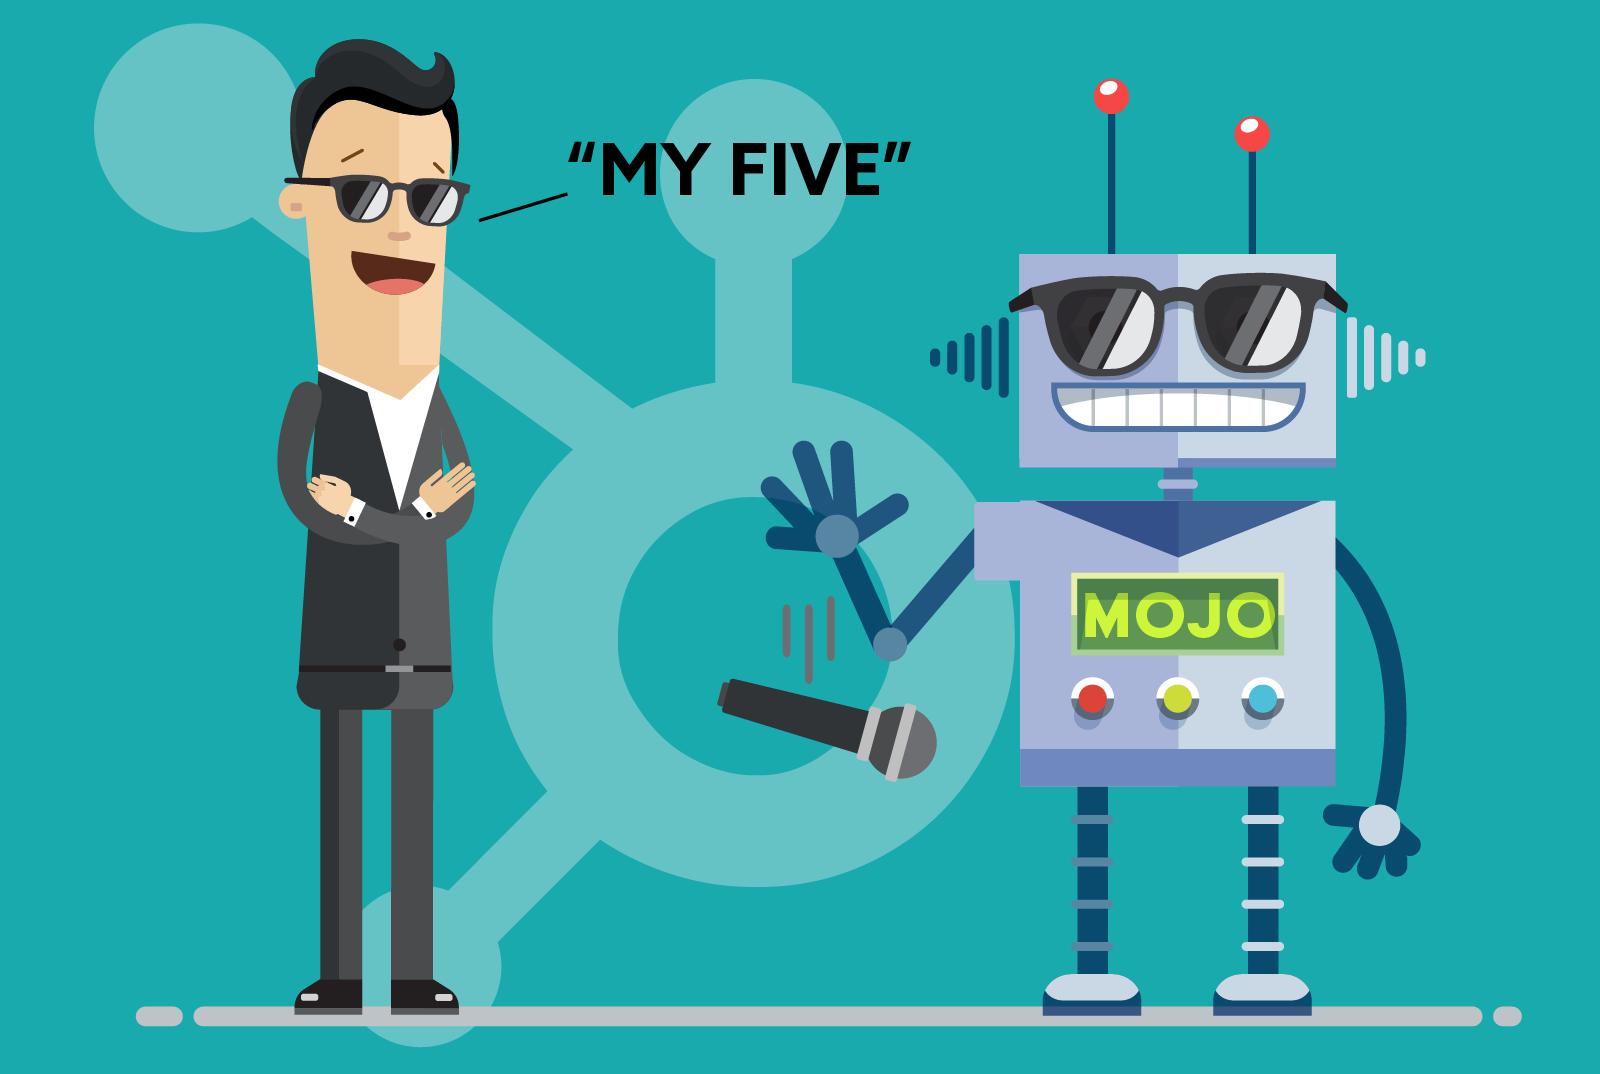 mojo-blog-new-year-automation.png